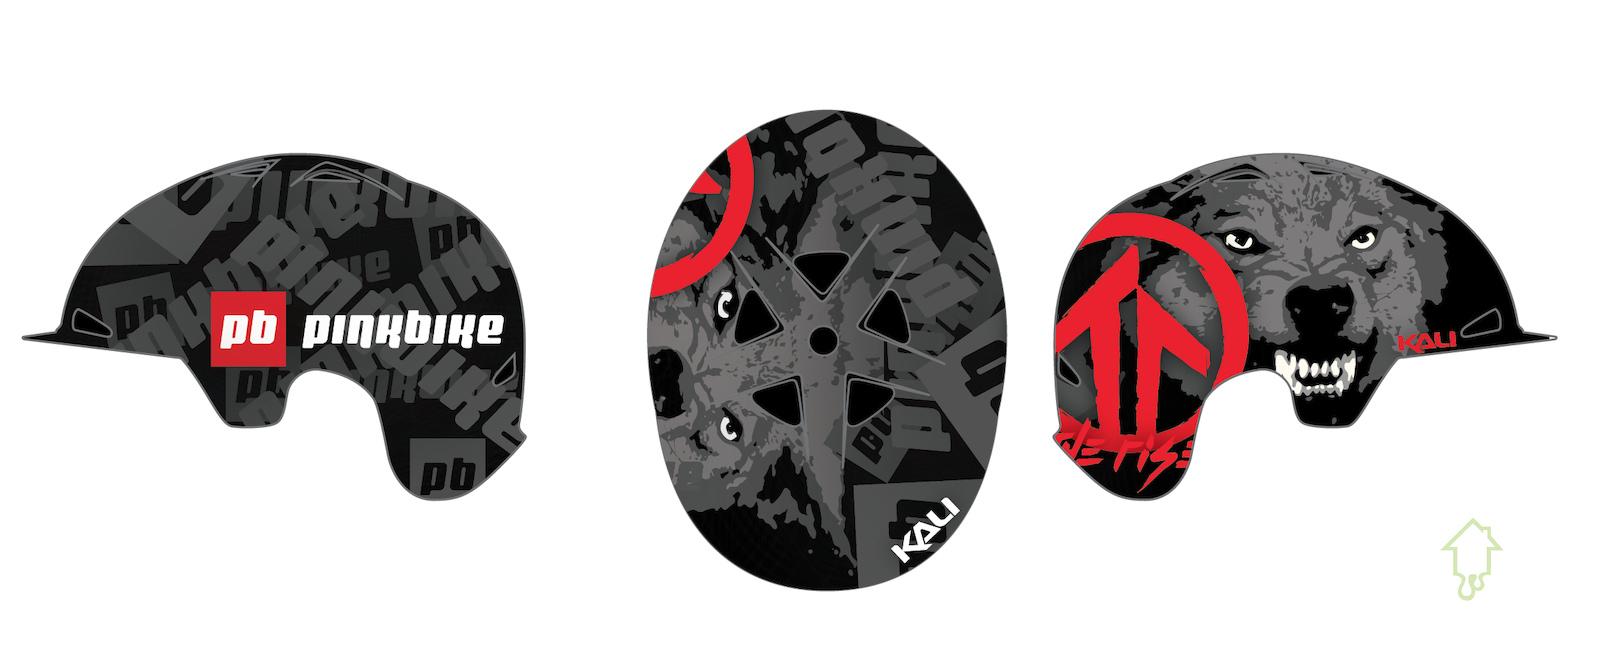 Matt MacDuff s custom Pinbike helmet by Painthouse Customs.